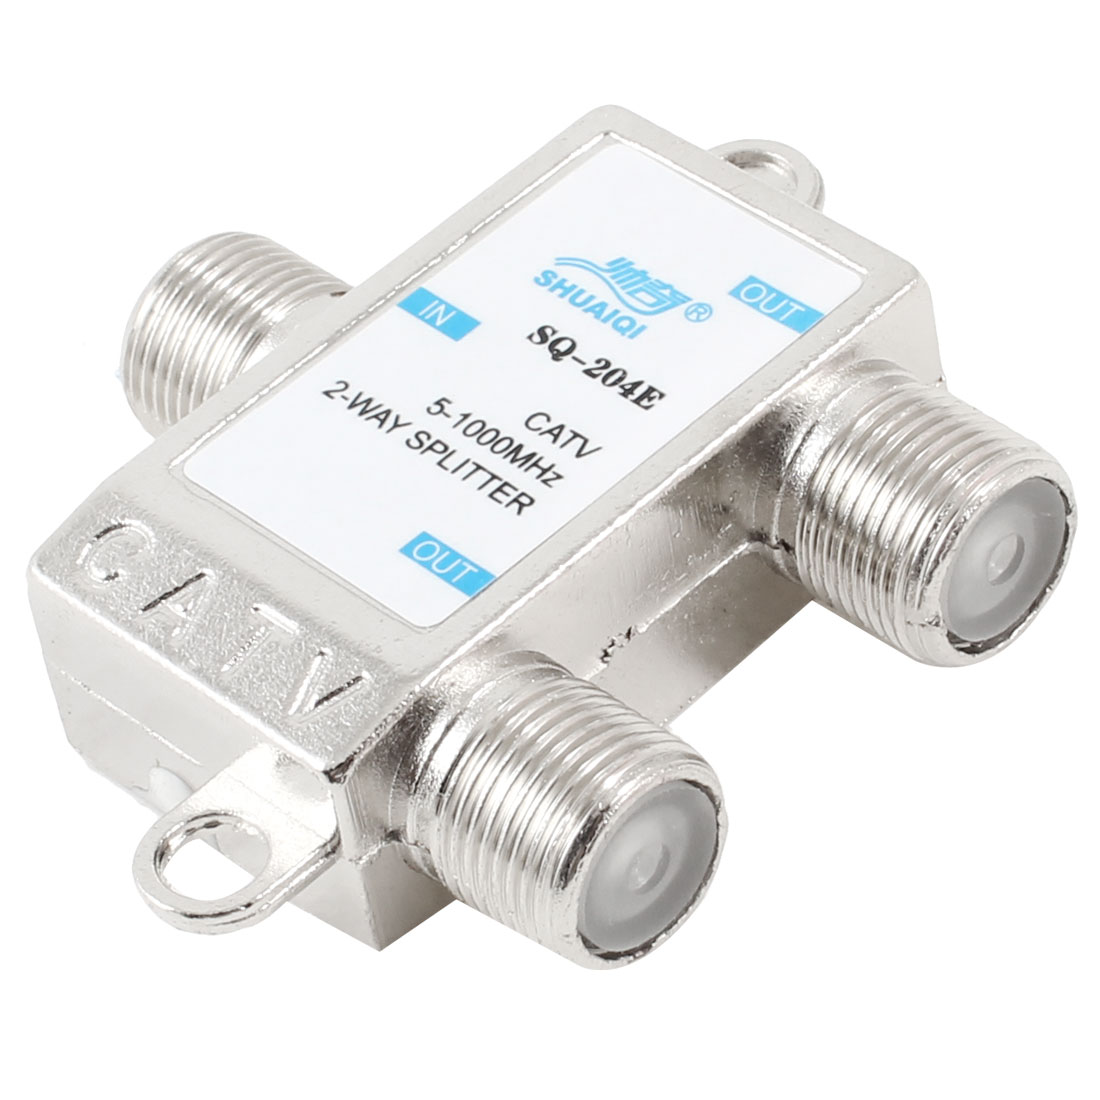 5-1000MHz Coaxial Signal CATV 2 Way Splitter Silver Tone w Screws